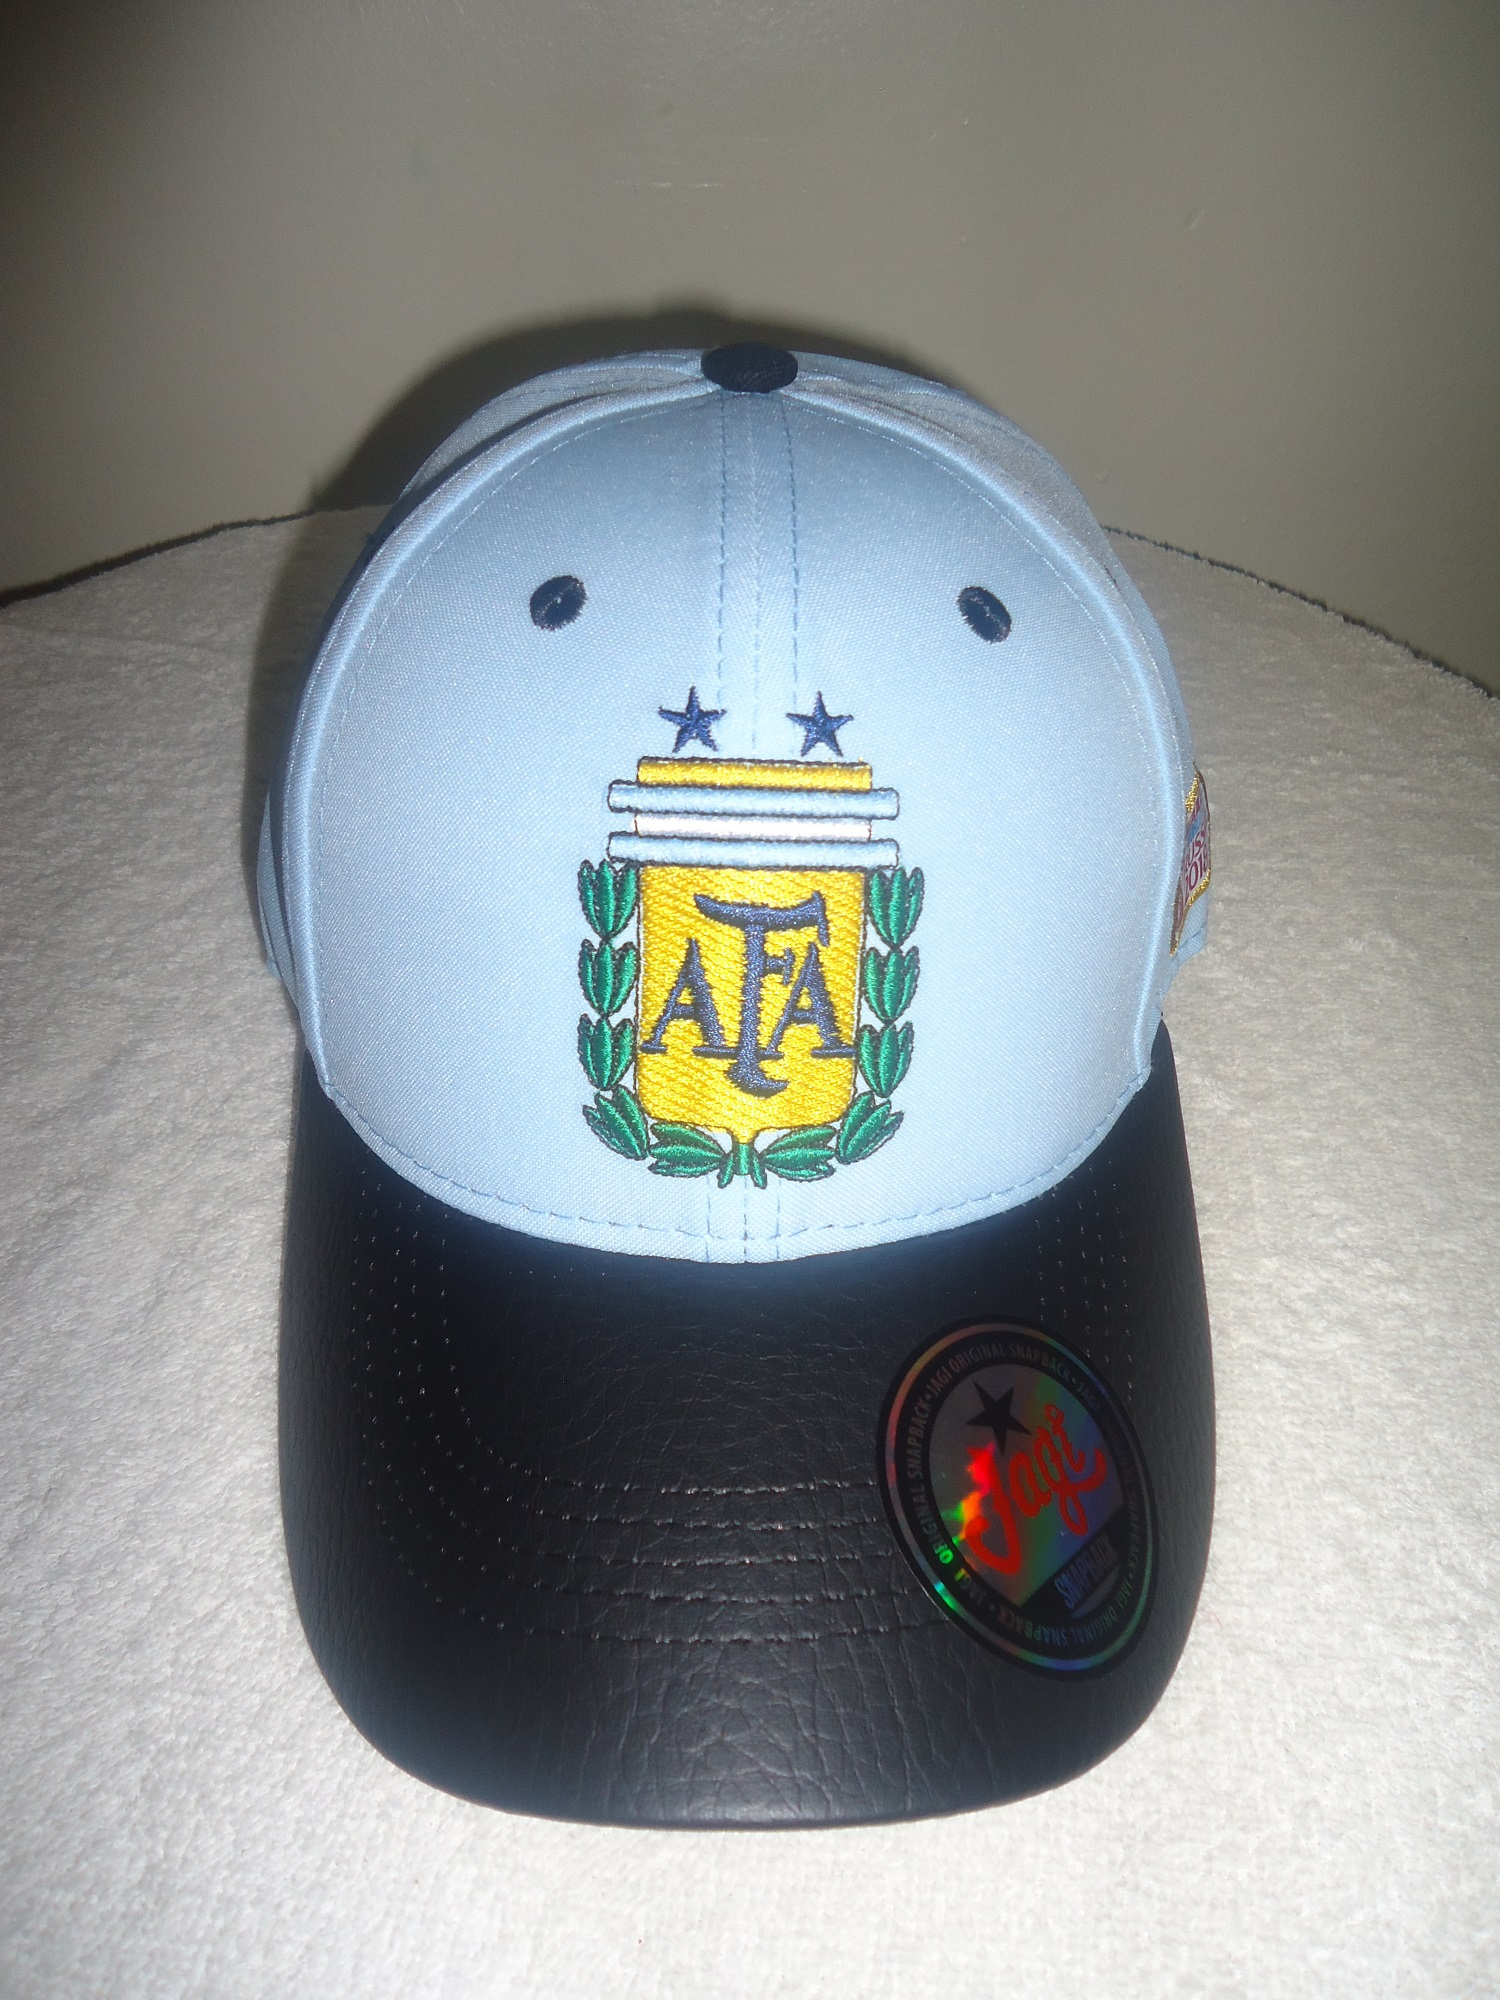 Argentina FIFA World Cup Russia 2018 soccer Hat Cap · SportsMegas ... 882bc4e0556